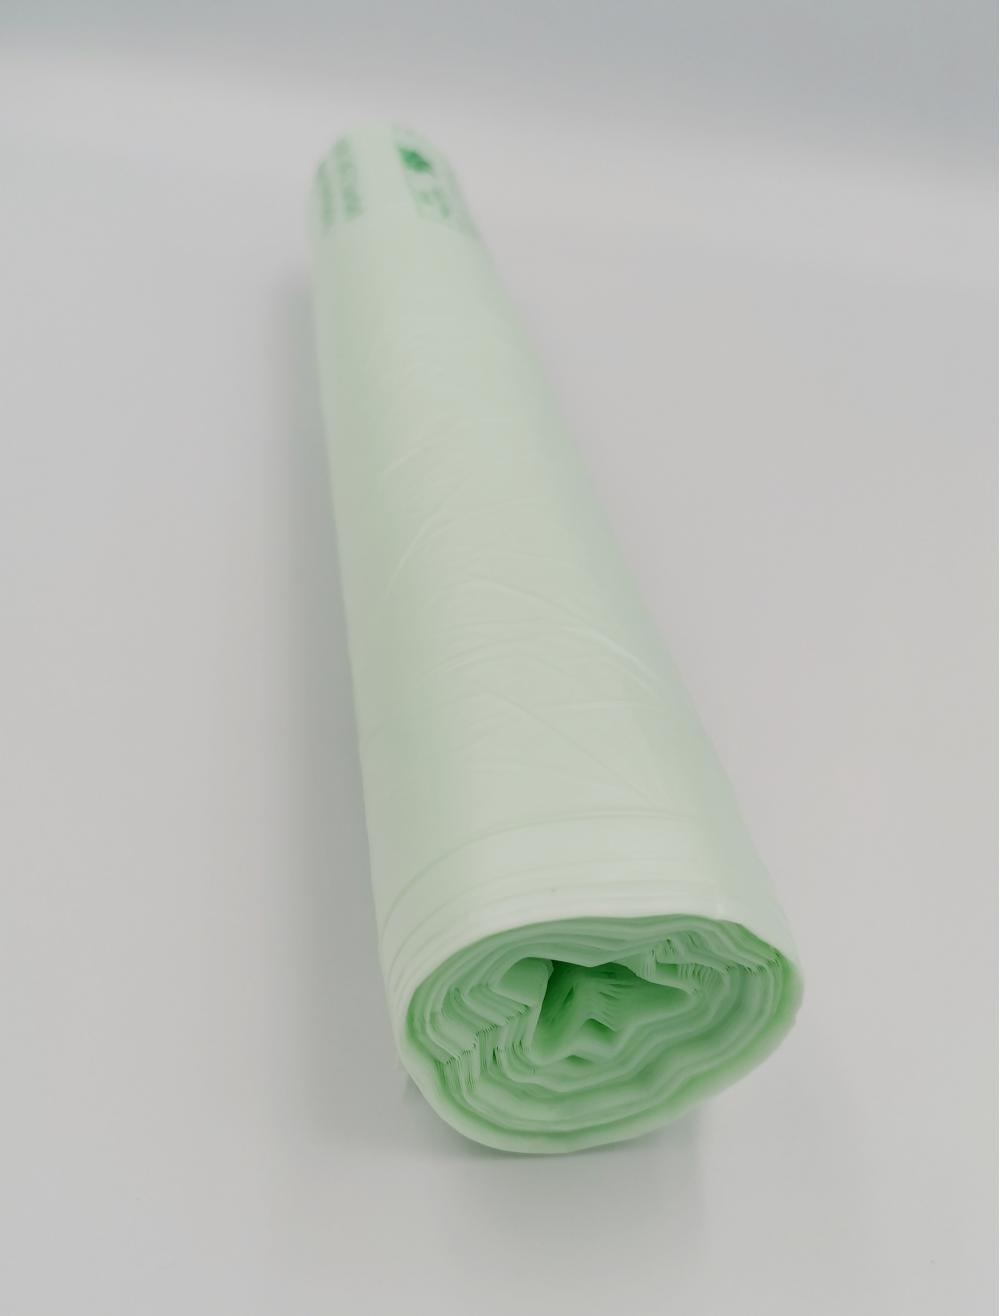 EN13432 Hazardous Trash Plastic Bags